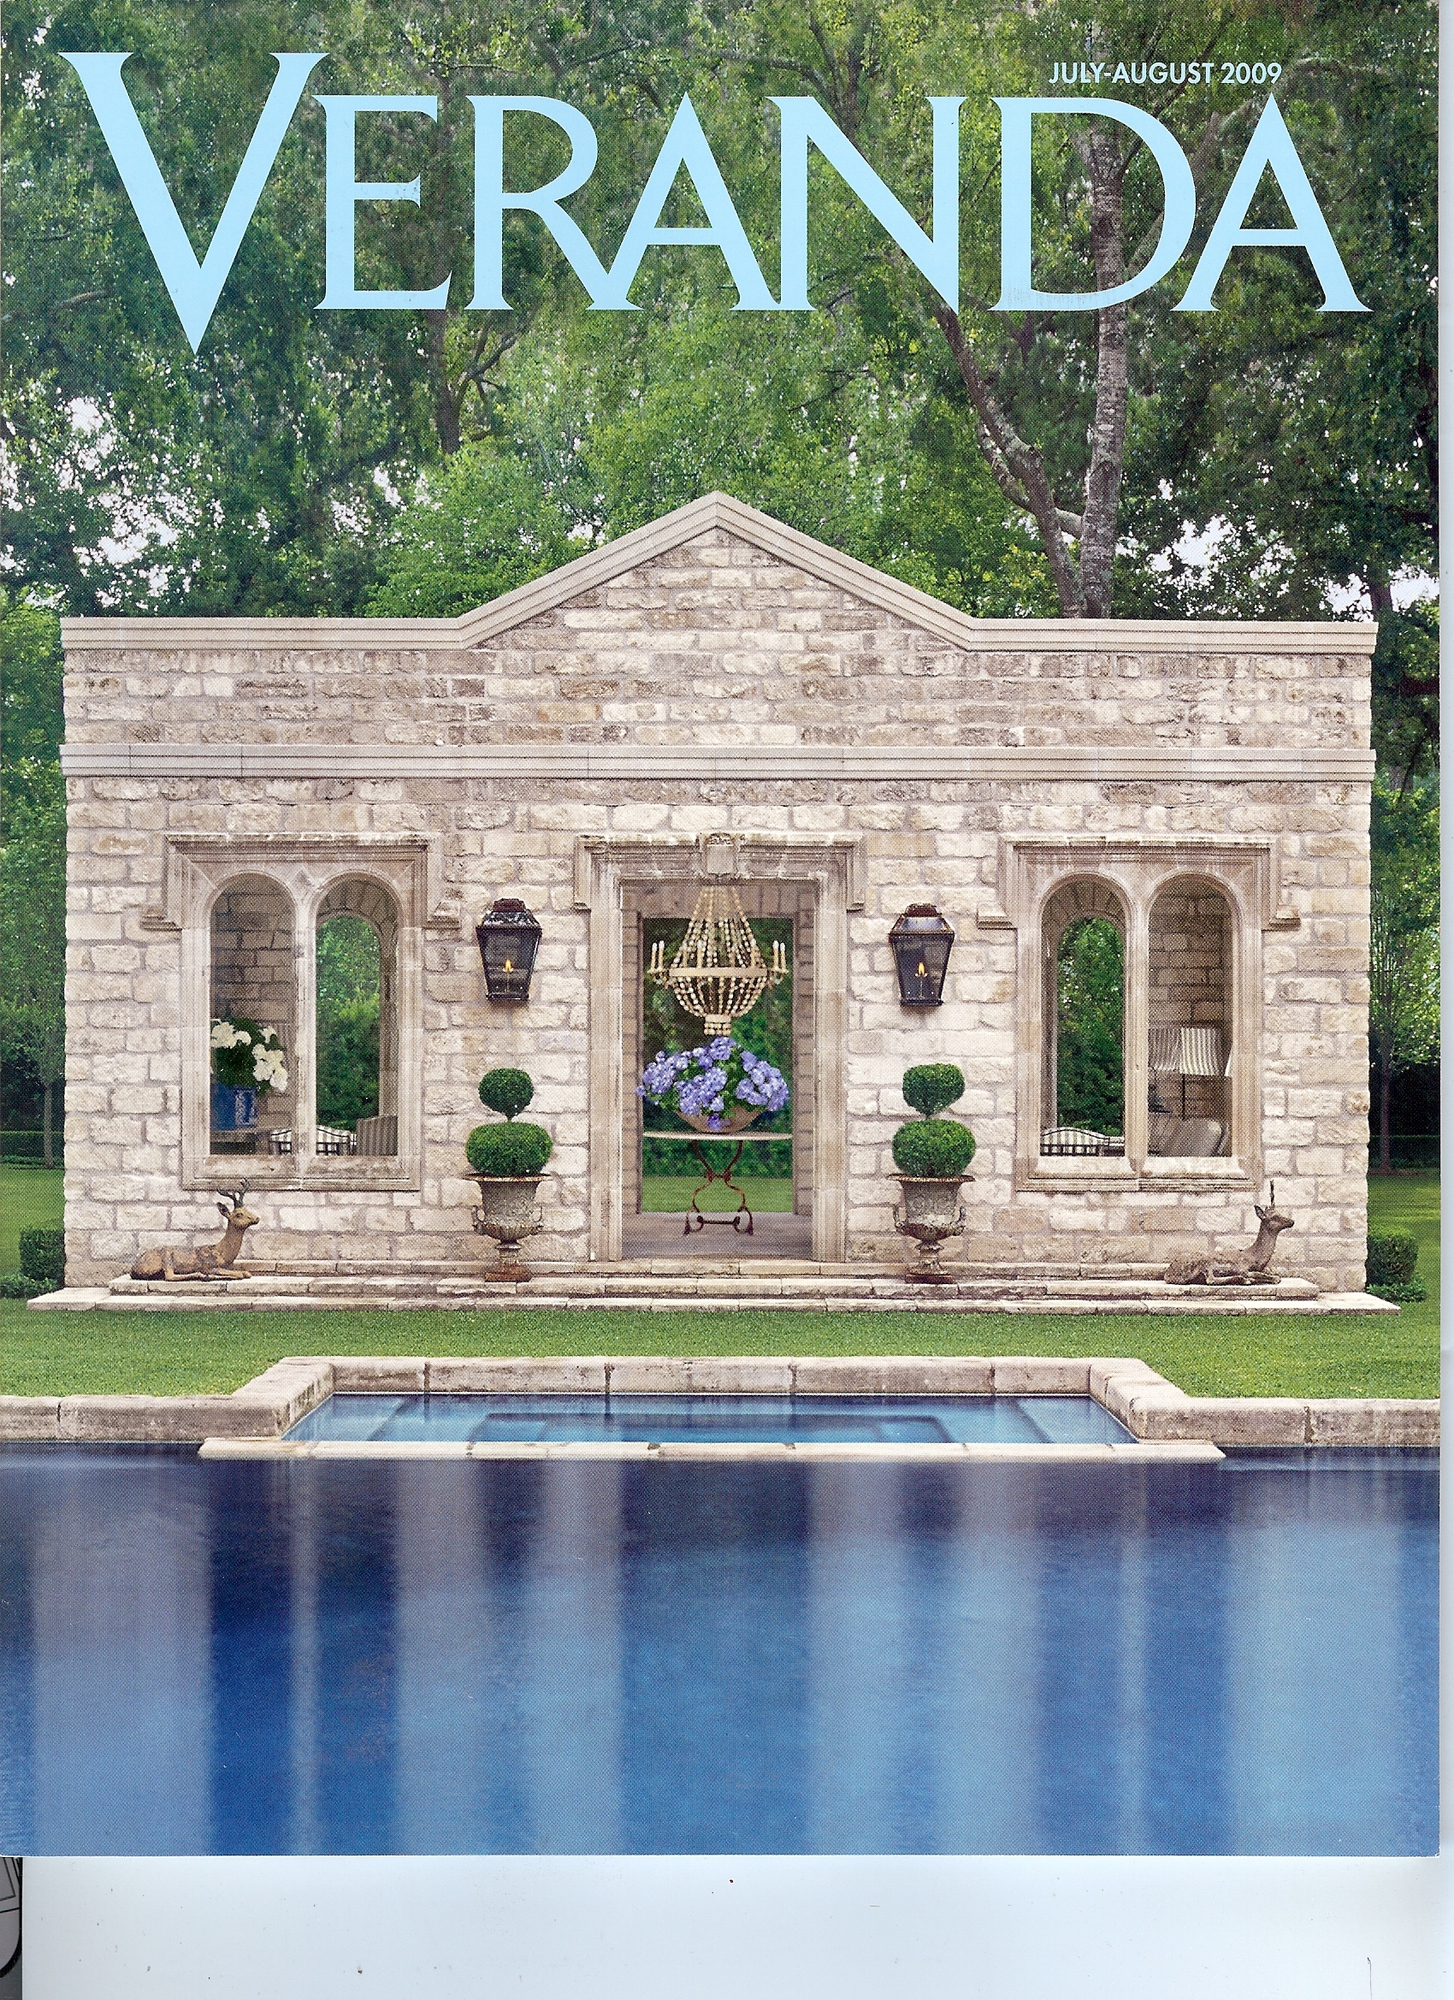 2009/07 Veranda Cover